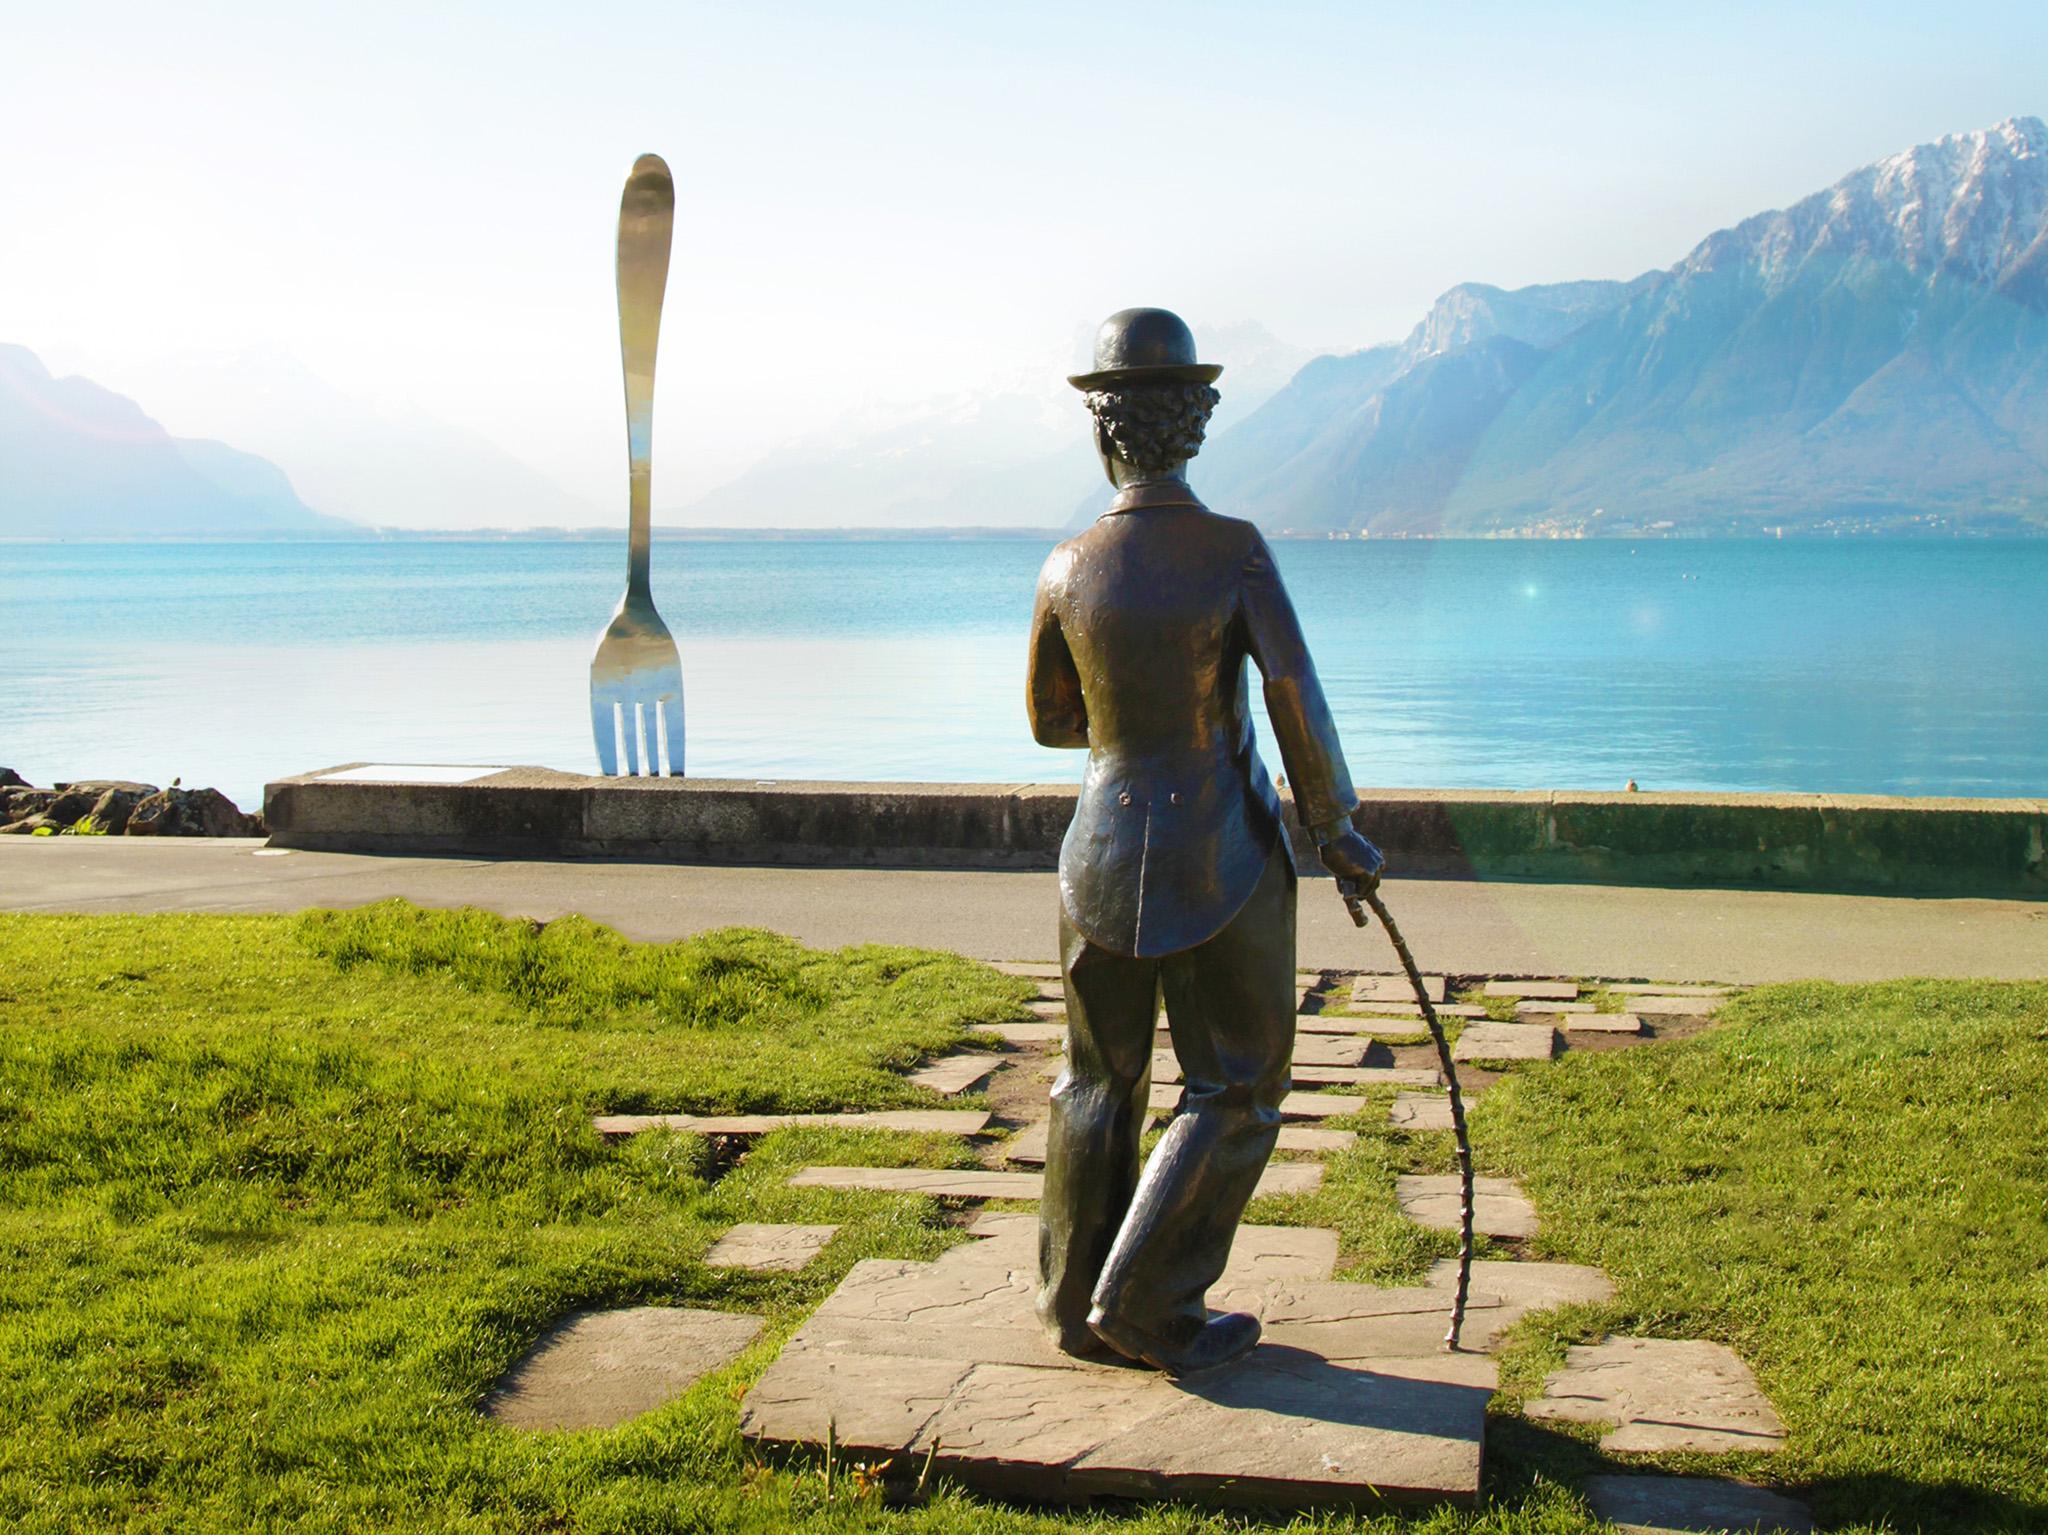 kt_2020_300_Keytours_excursions_Swisstours_chaplin-world2_2048_10